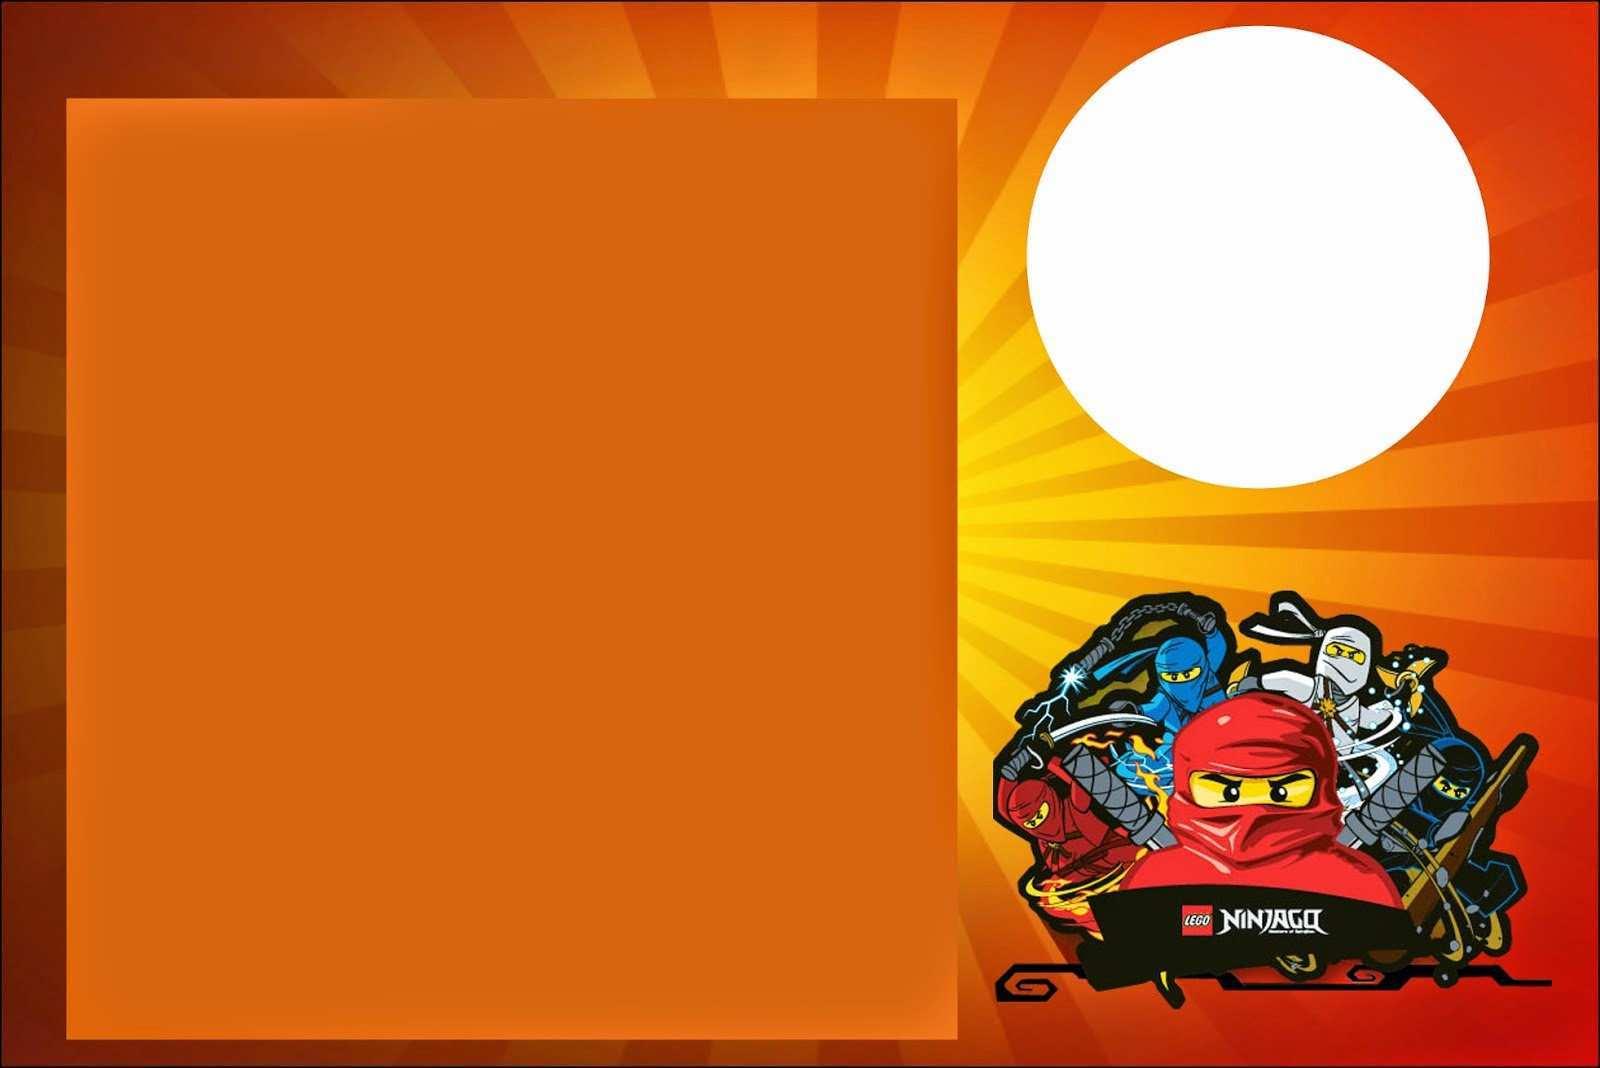 42 Best Ninjago Party Invitation Template in Photoshop by Ninjago Party Invitation Template